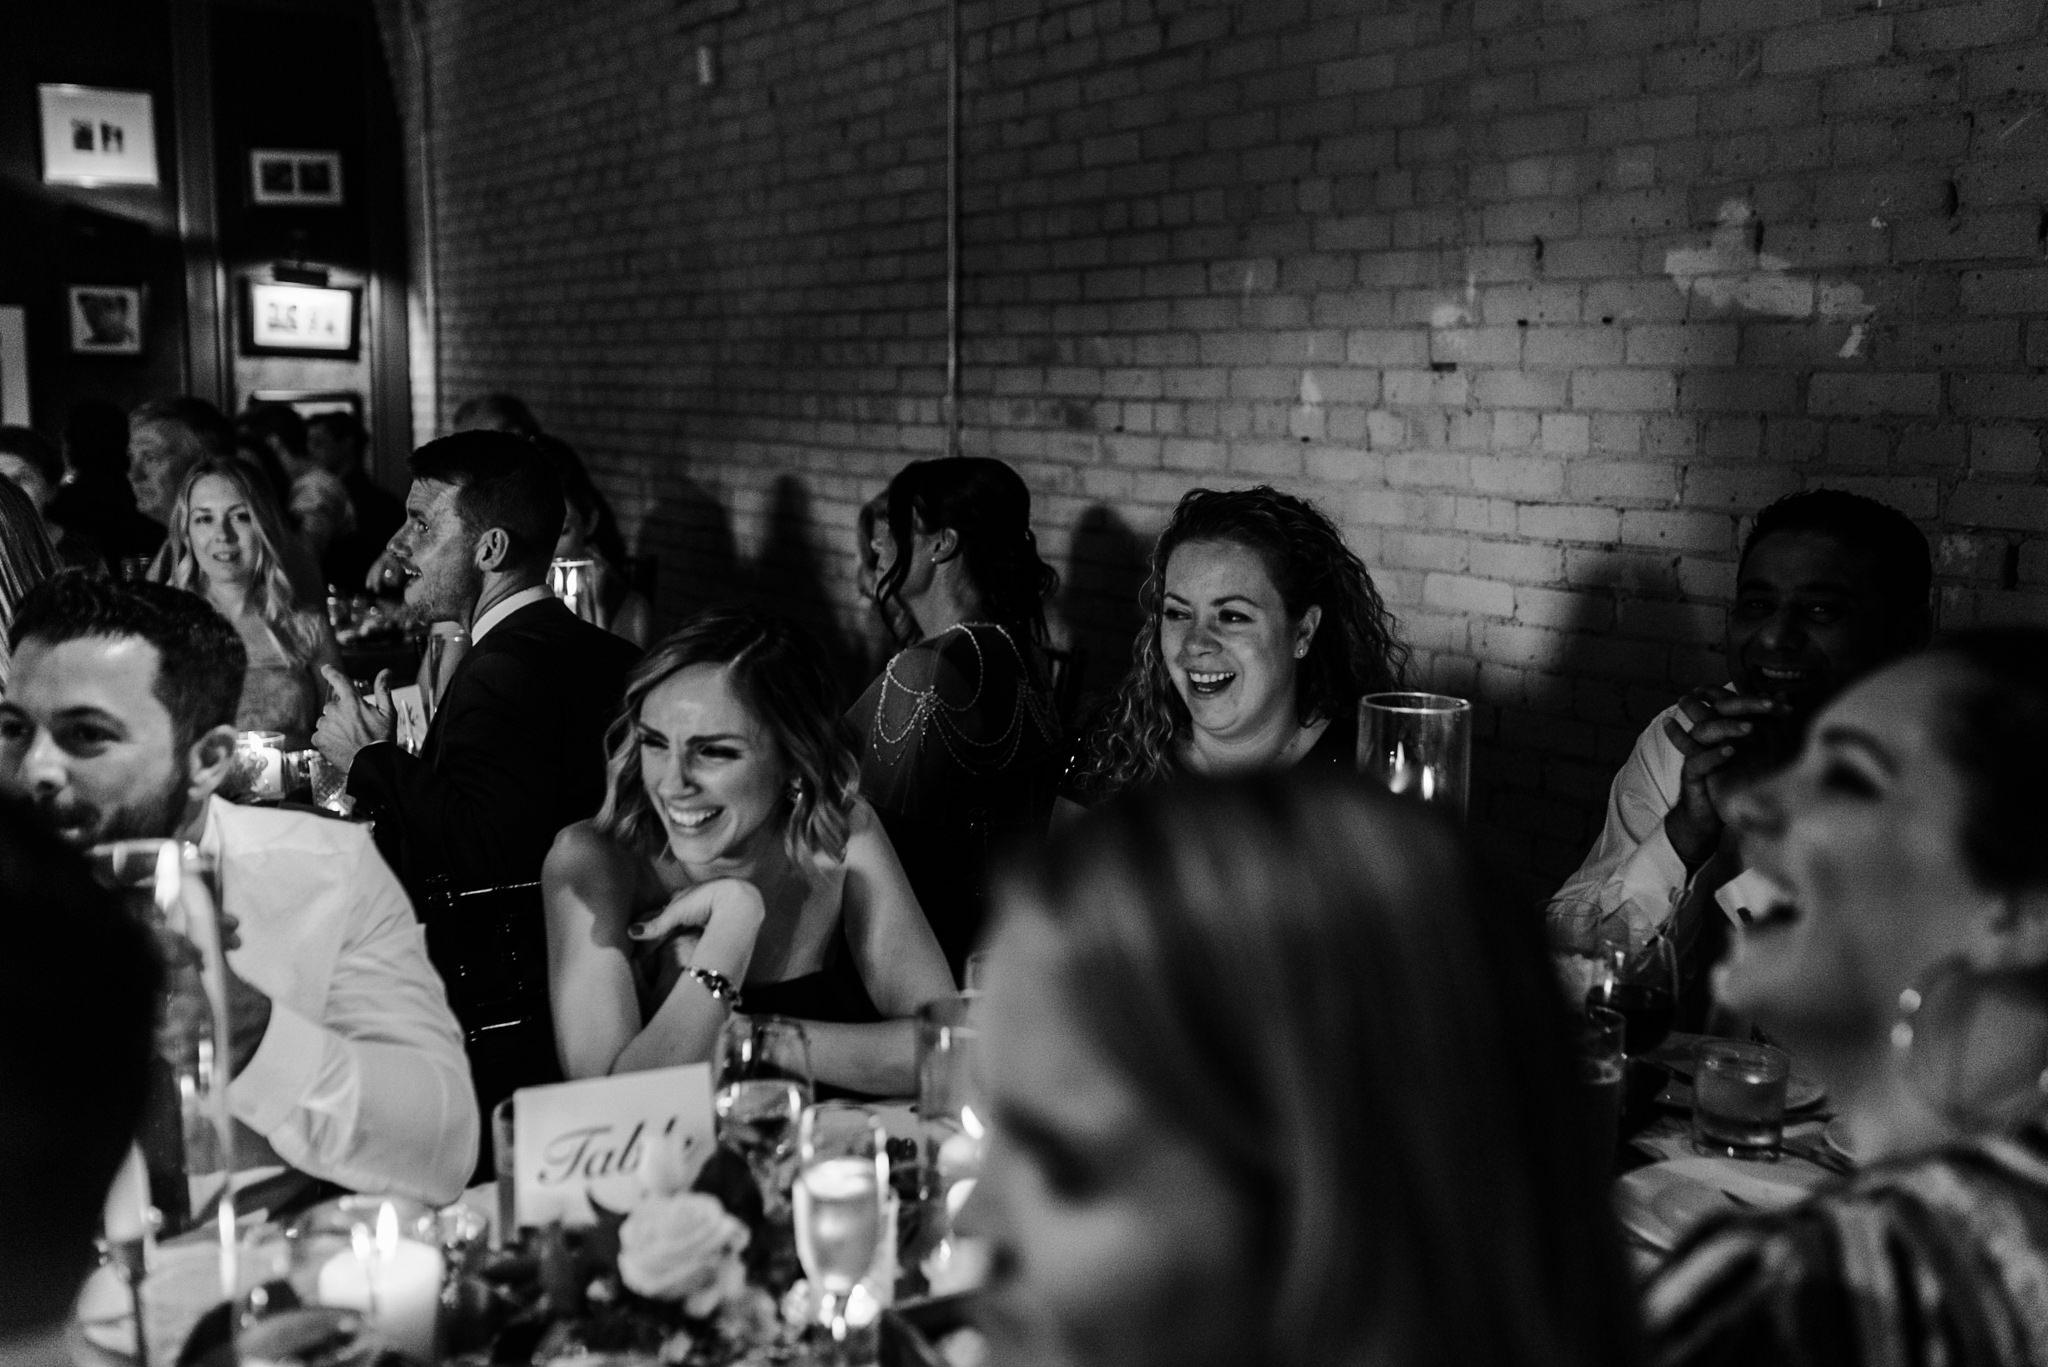 071-guests-candids-documentary-wedding-photographer-reception-storys-toronto.jpg